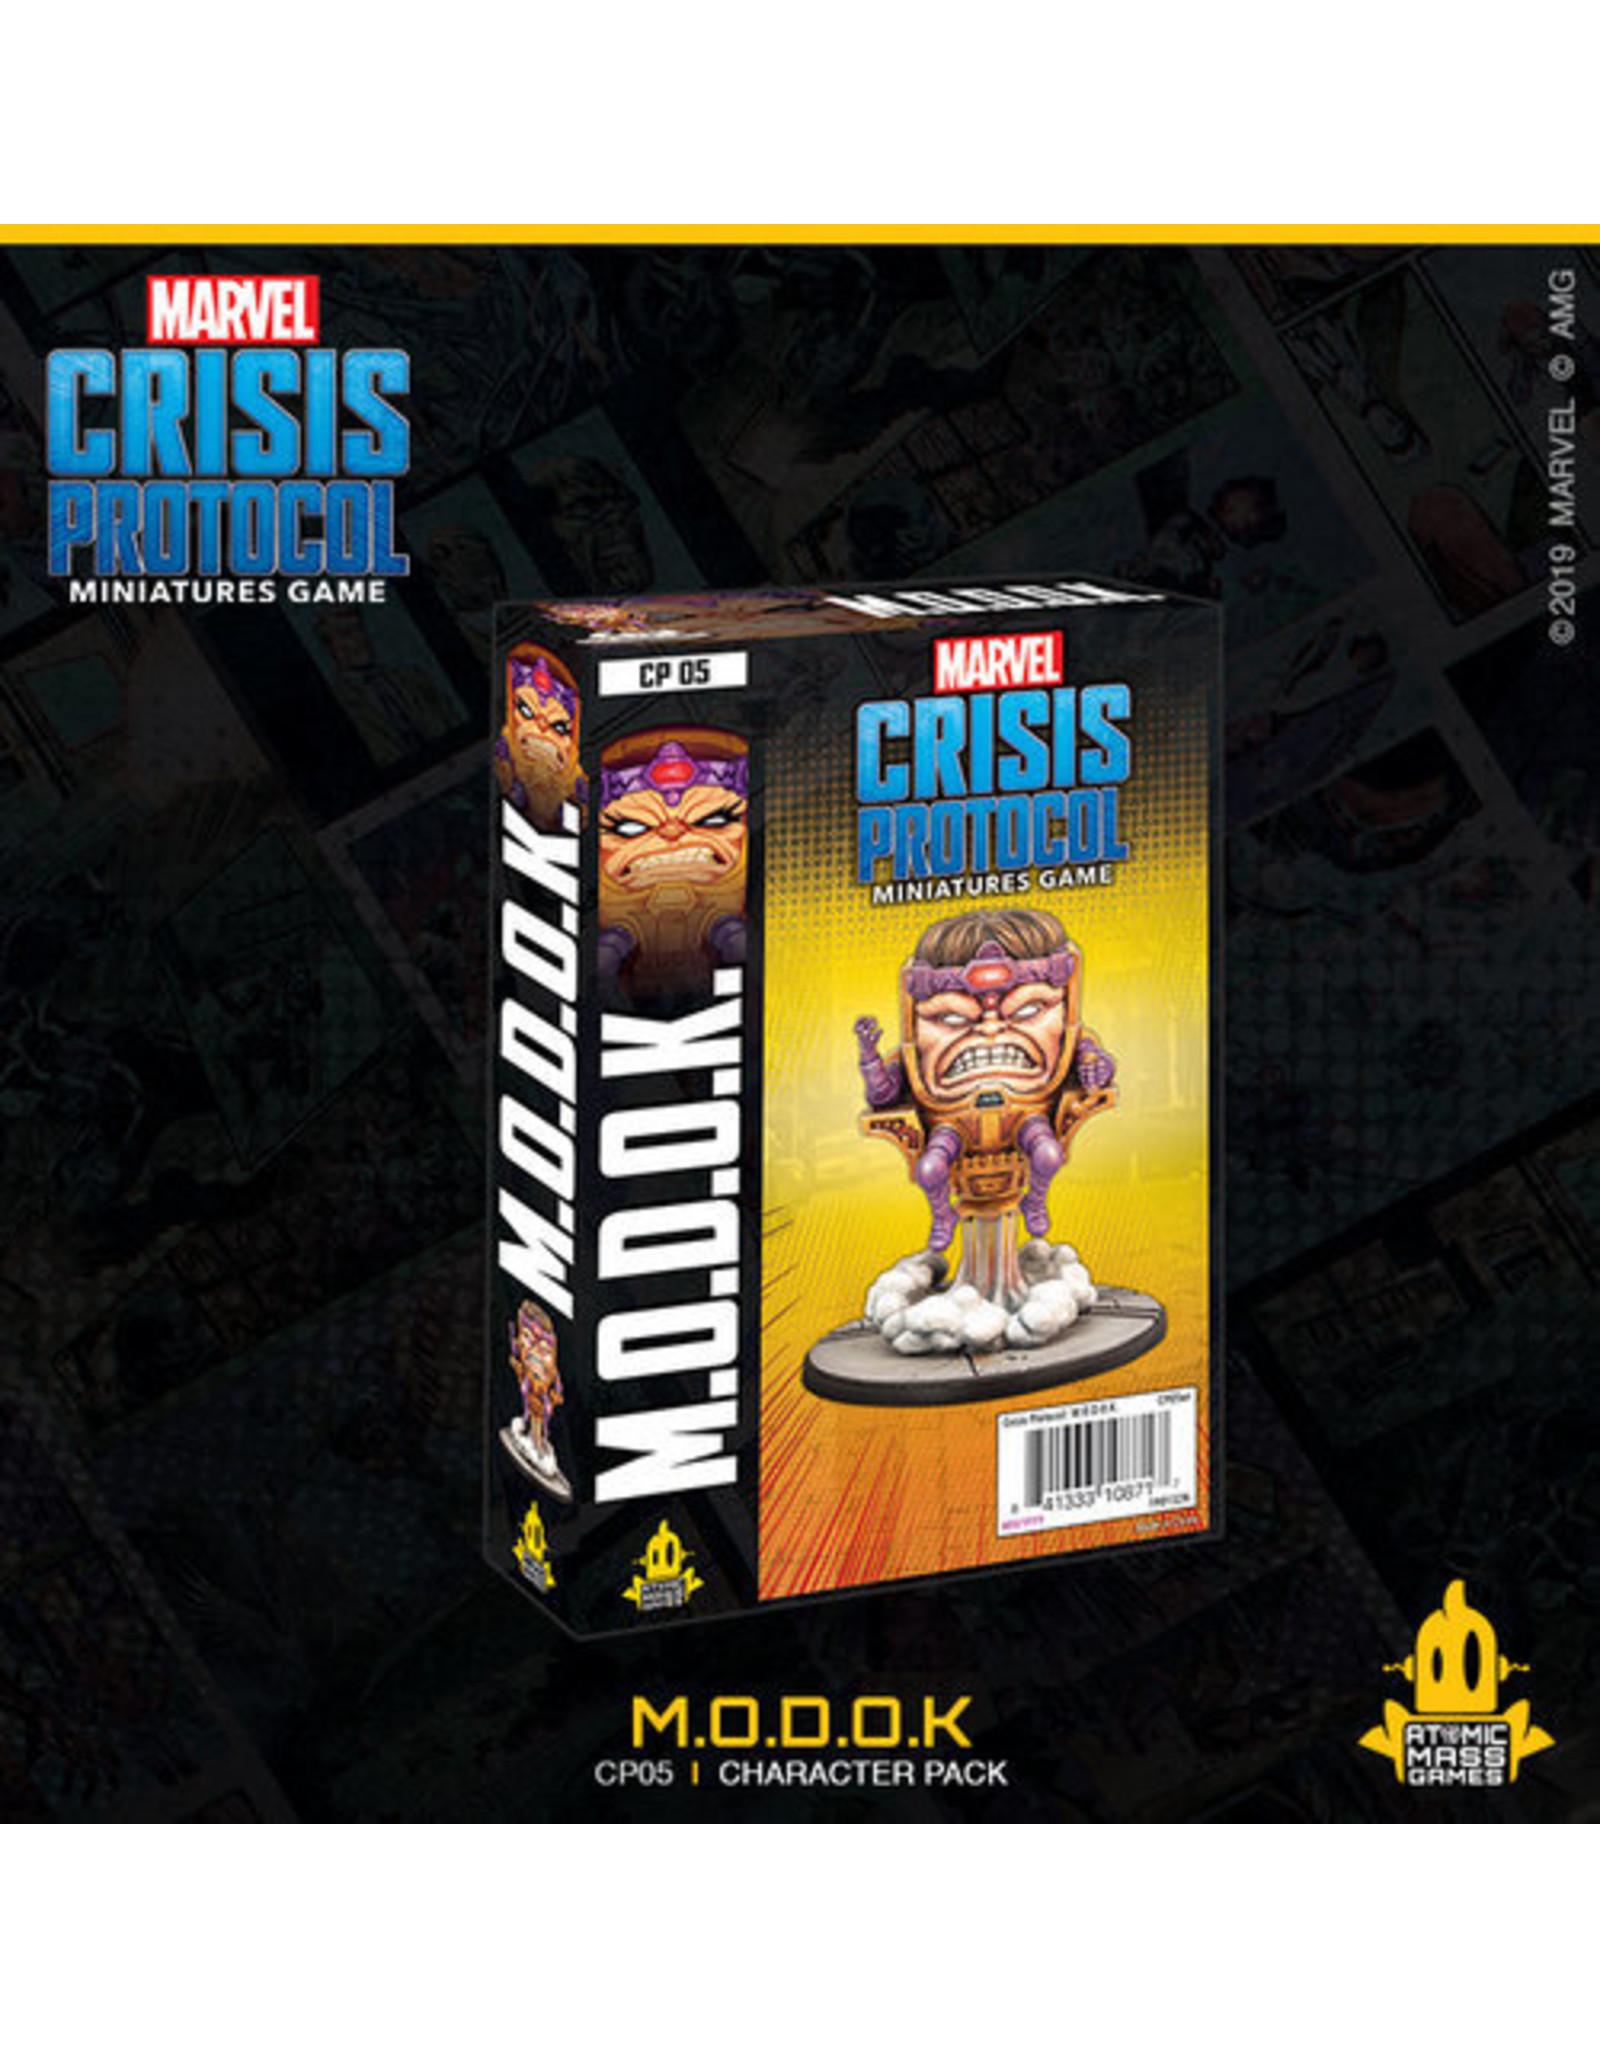 Atomic Mass Games MODOK - Marvel Crisis Protocol